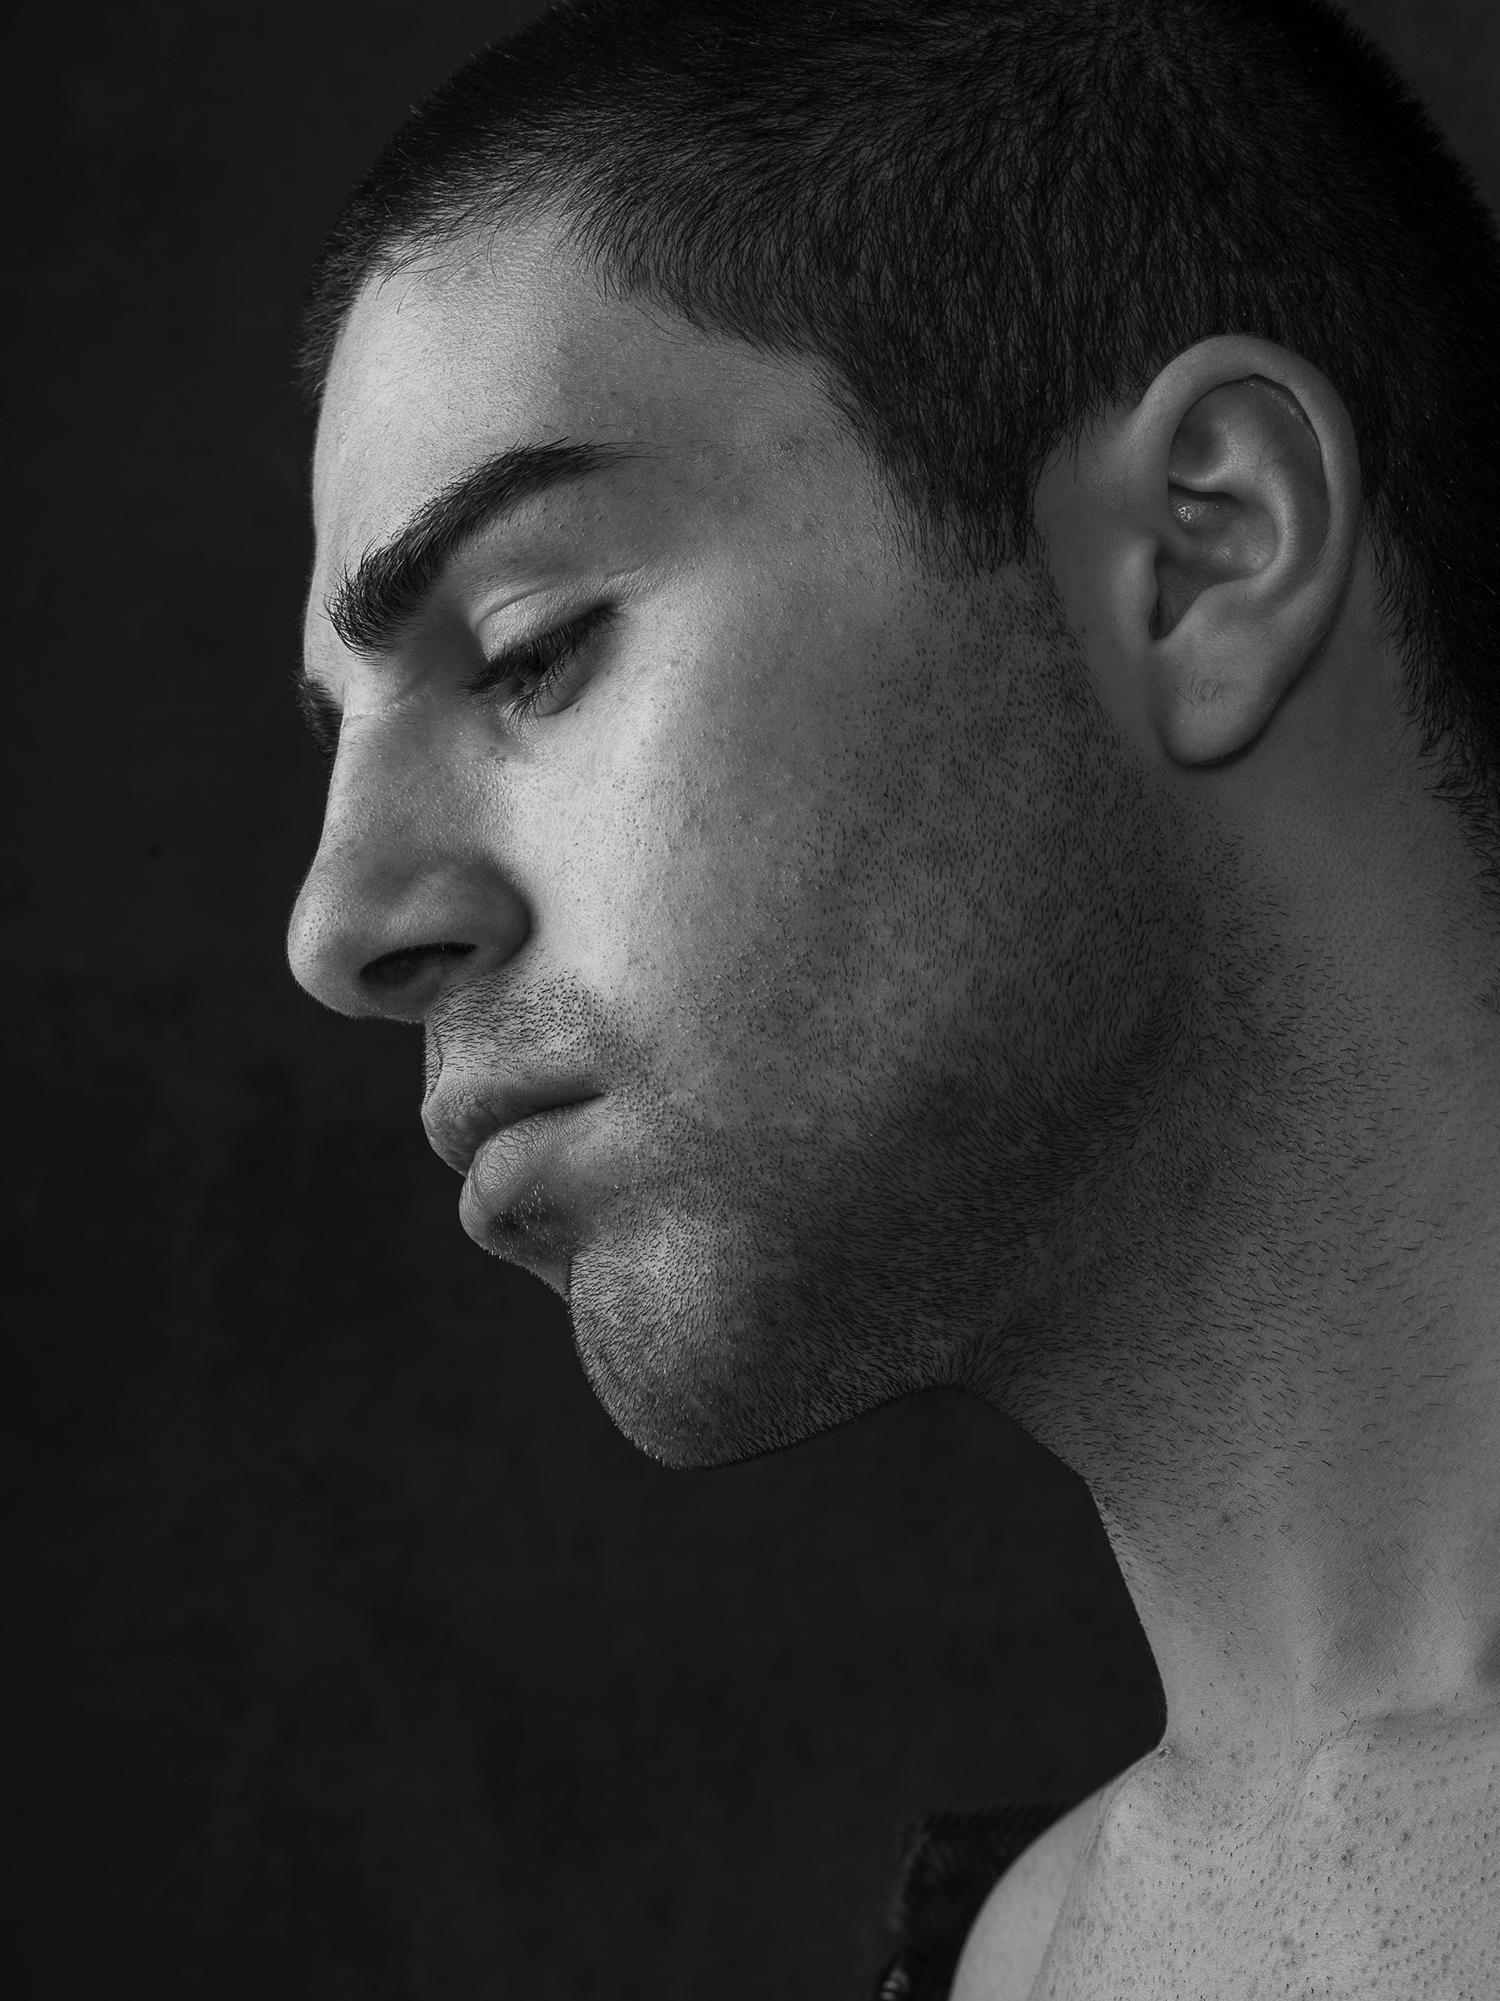 Intimate Strangers, Spartaki Profile B&W